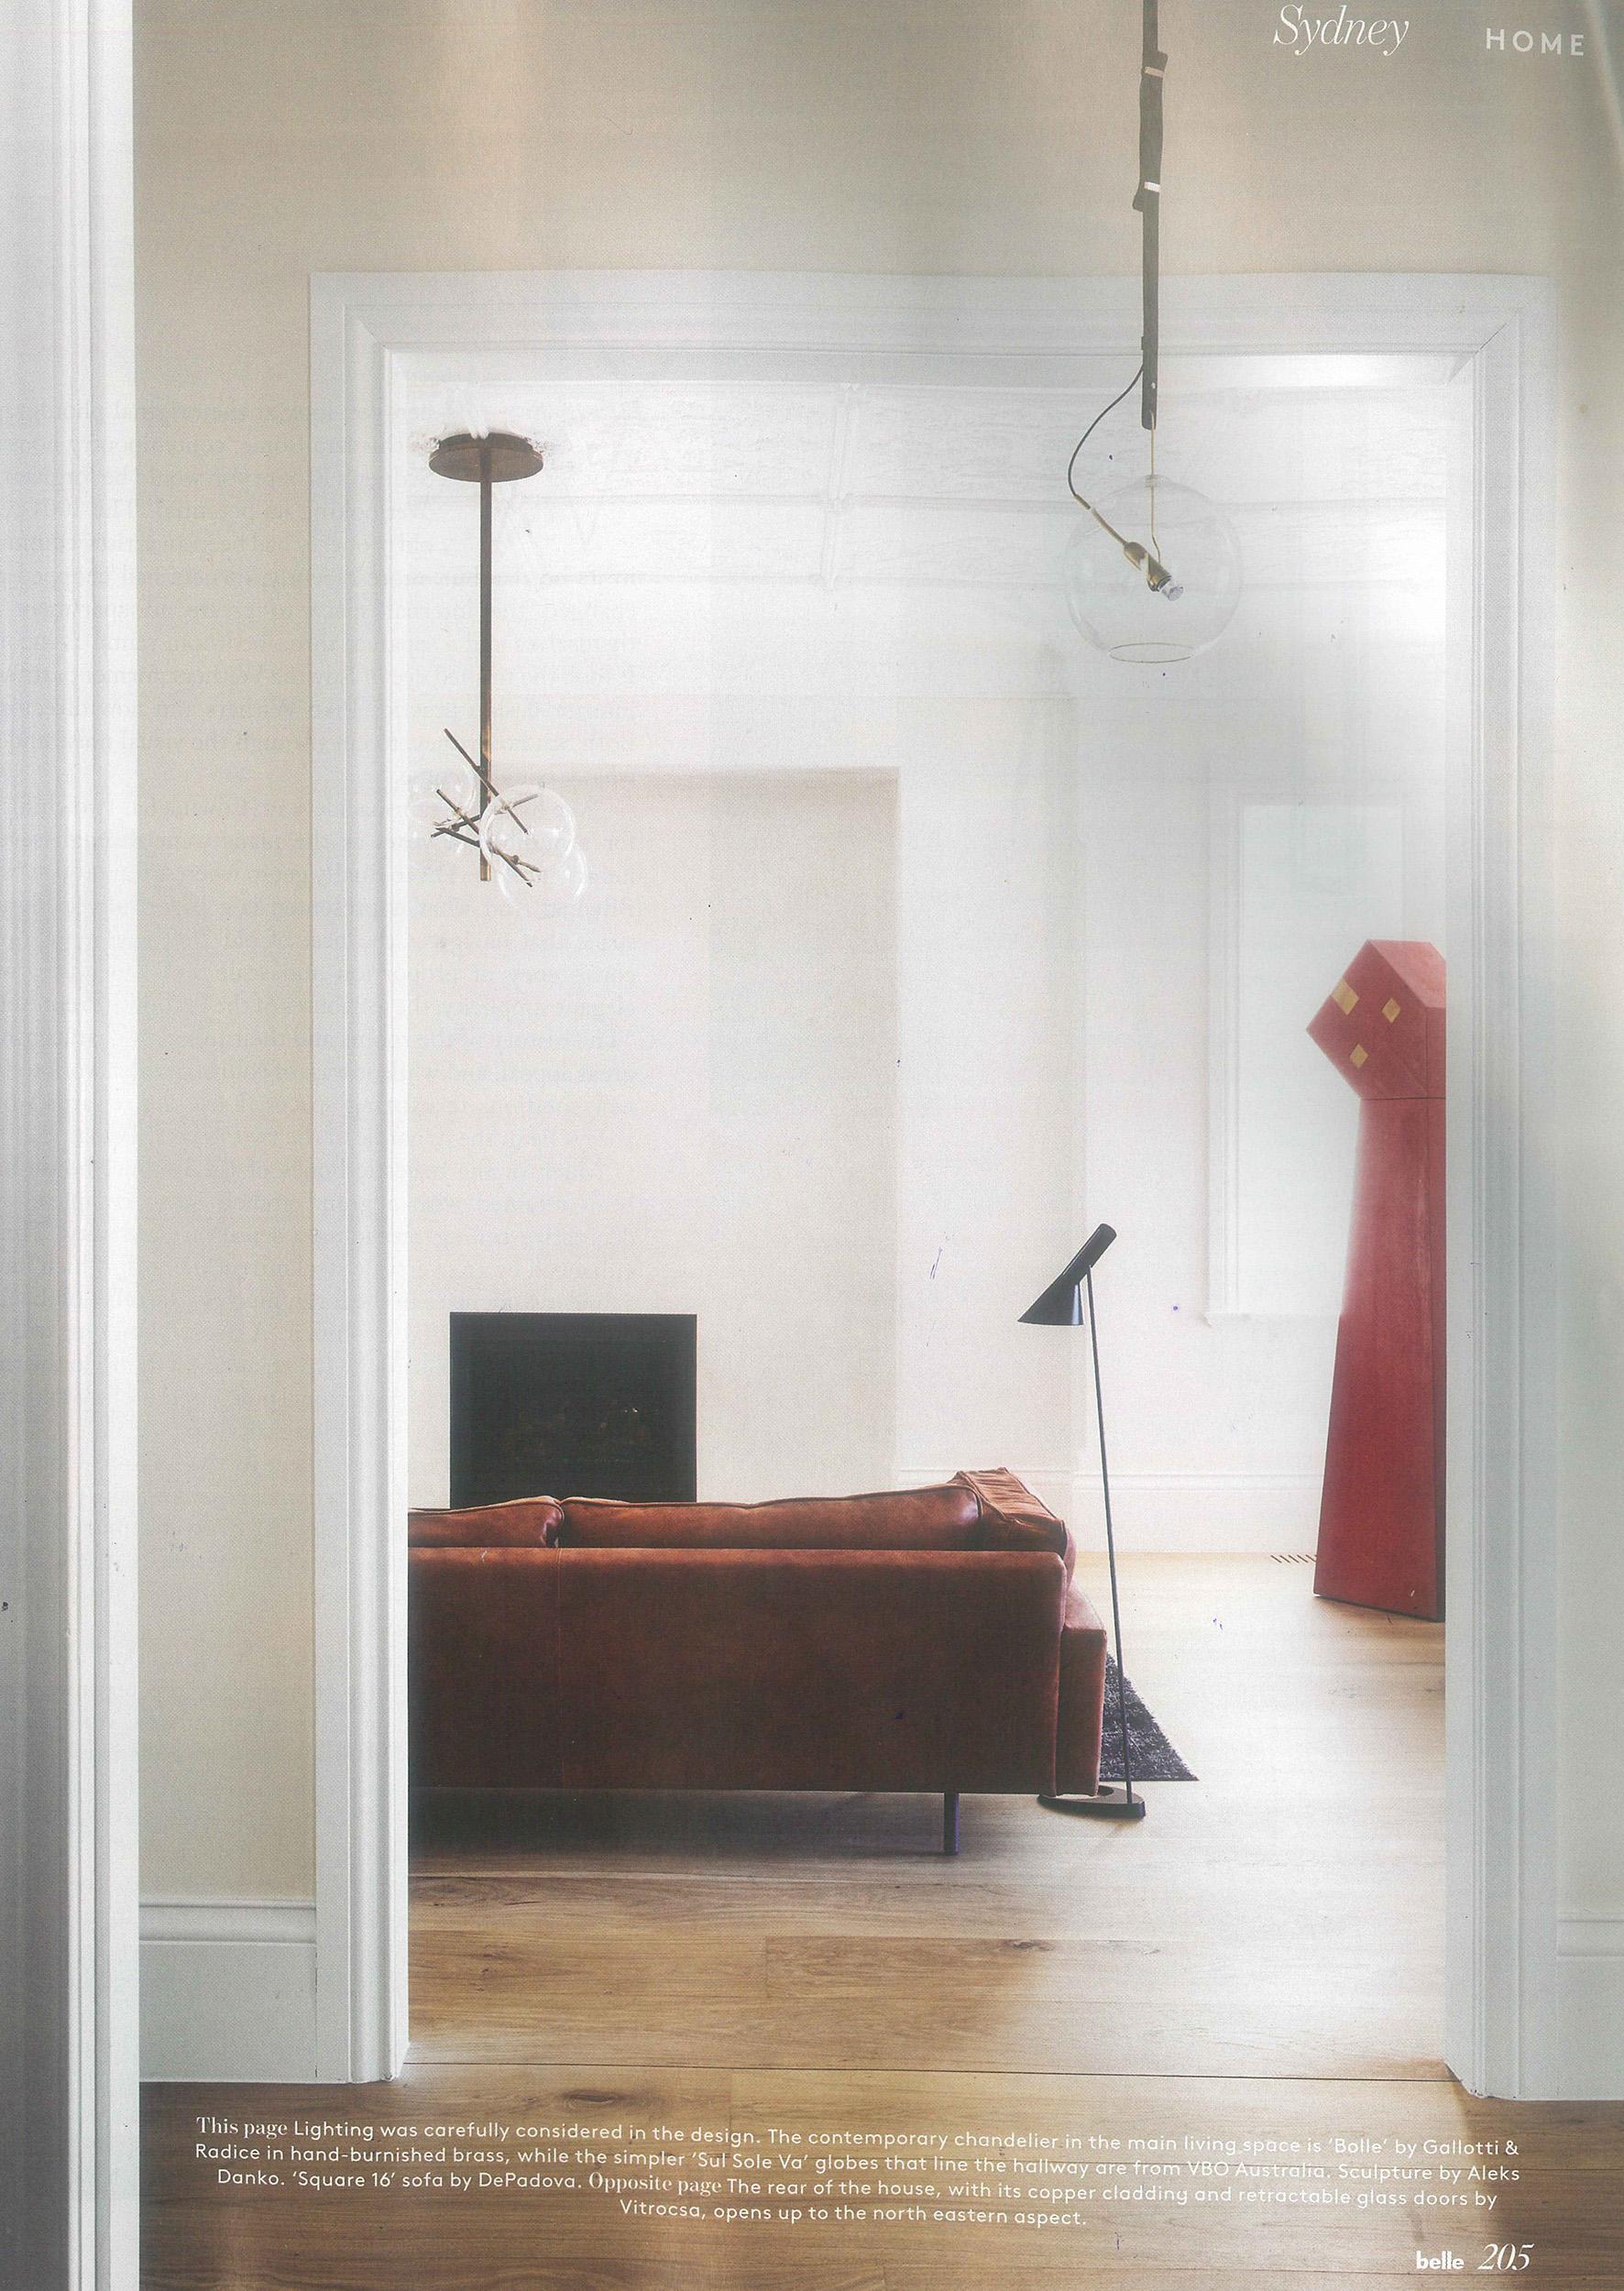 Belle Magazine - Bronte House 2